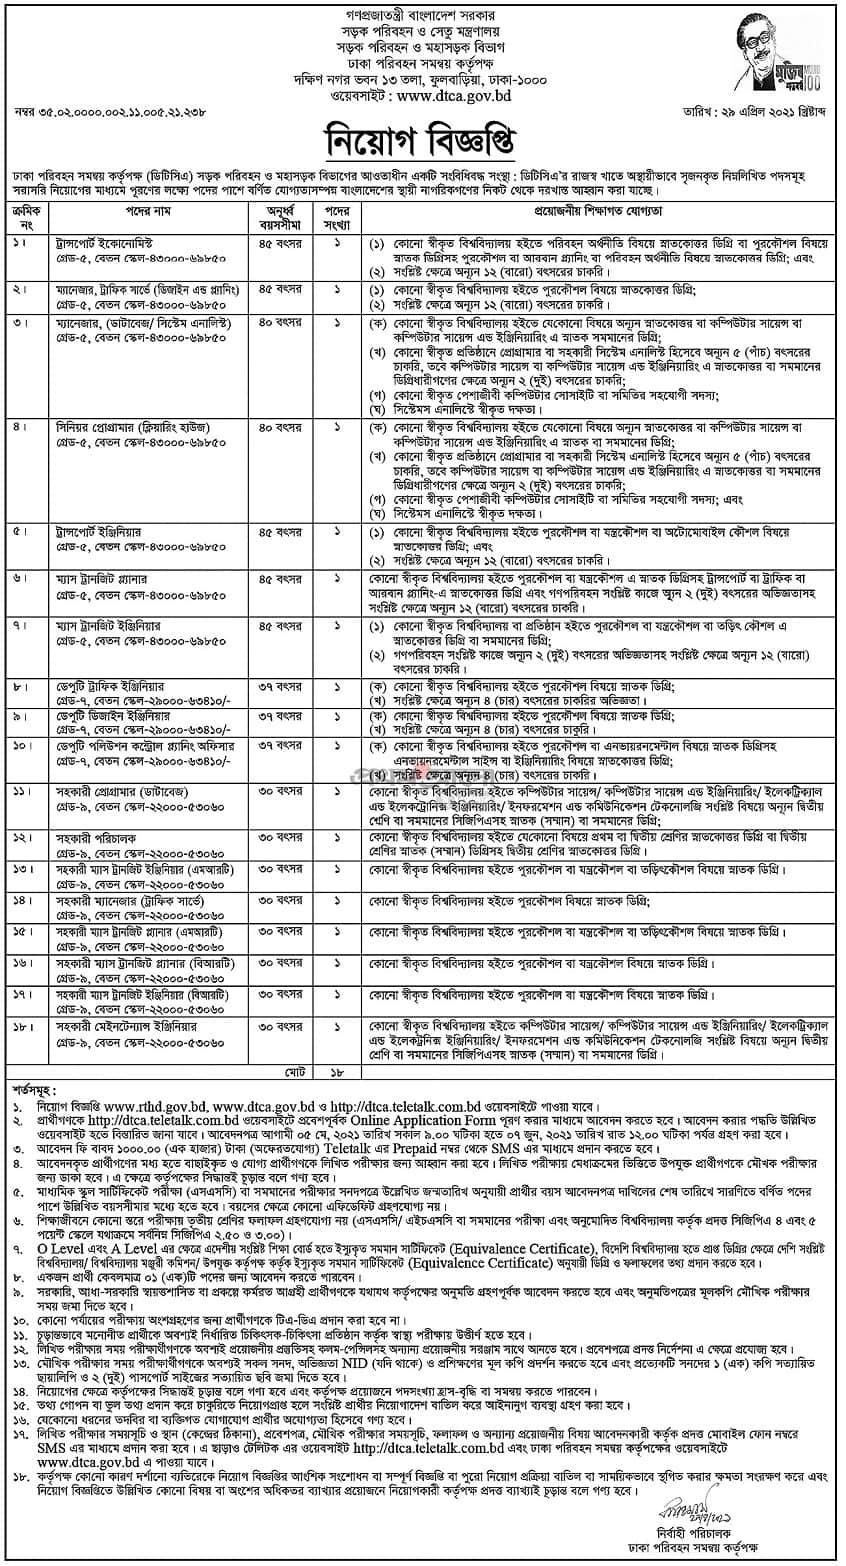 Road Transport and Highways Division Job Circular